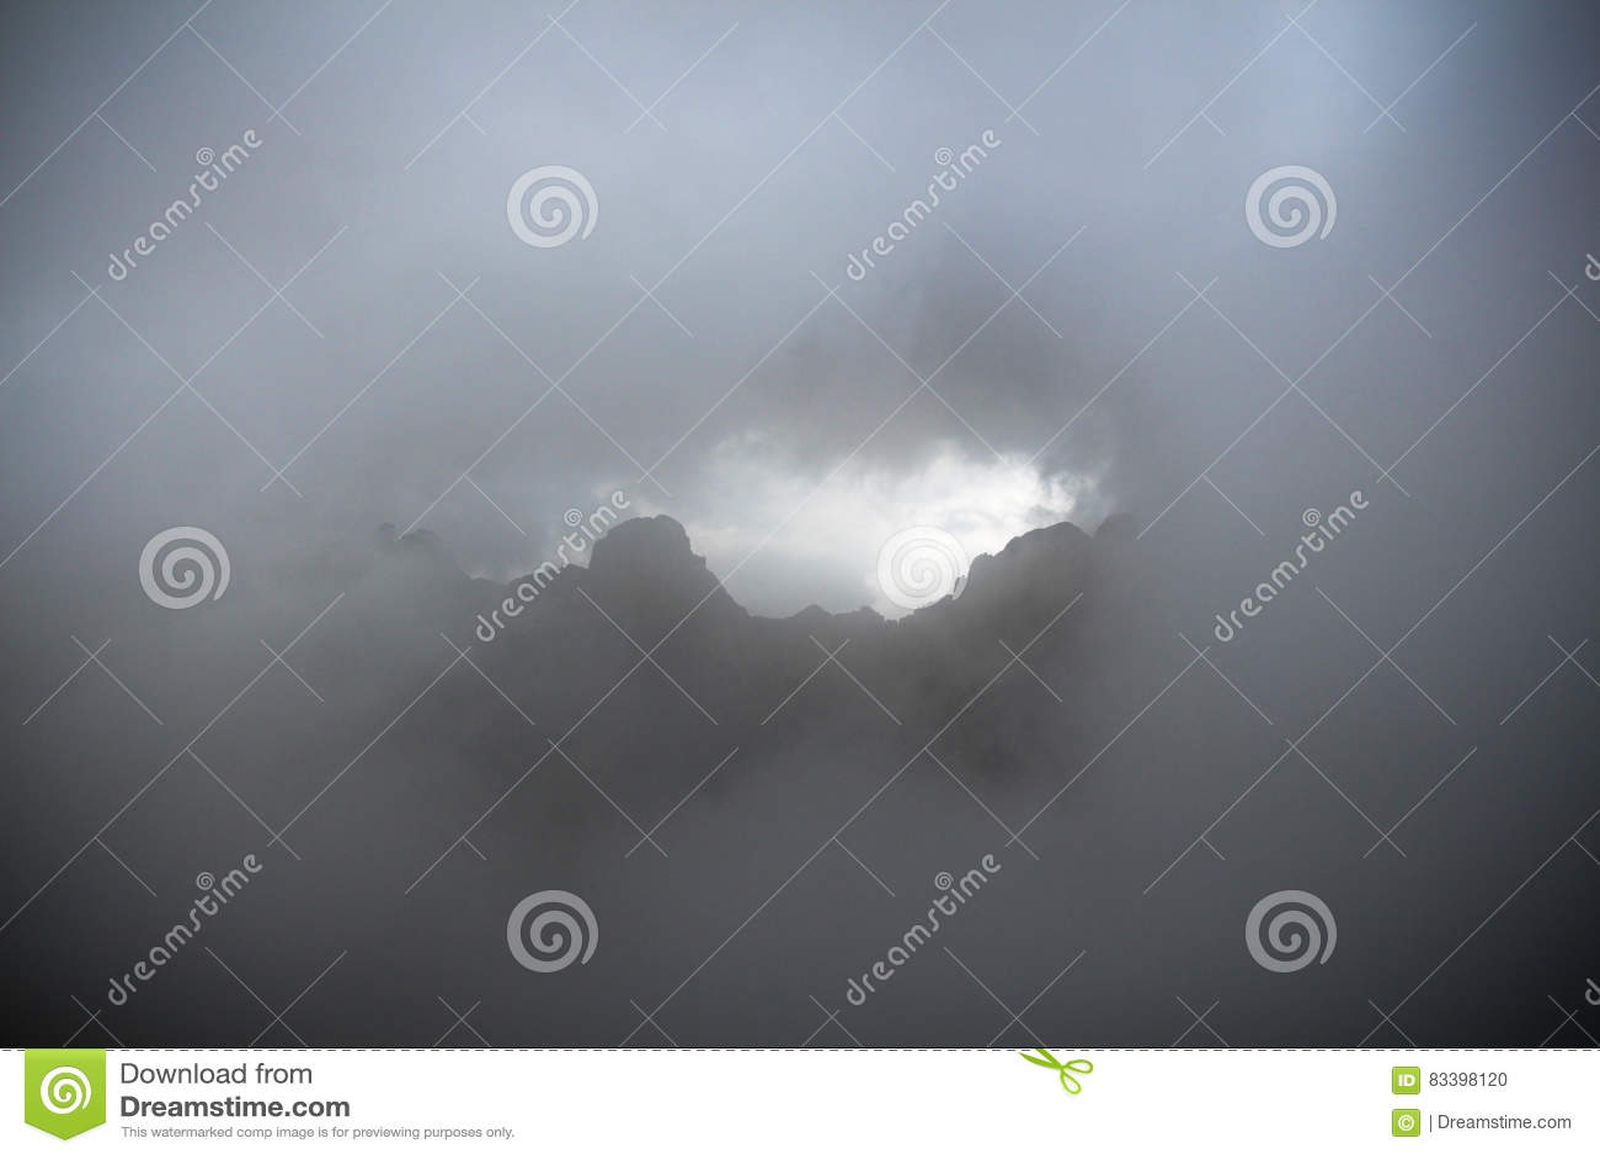 Starker Nebel in den Bergen